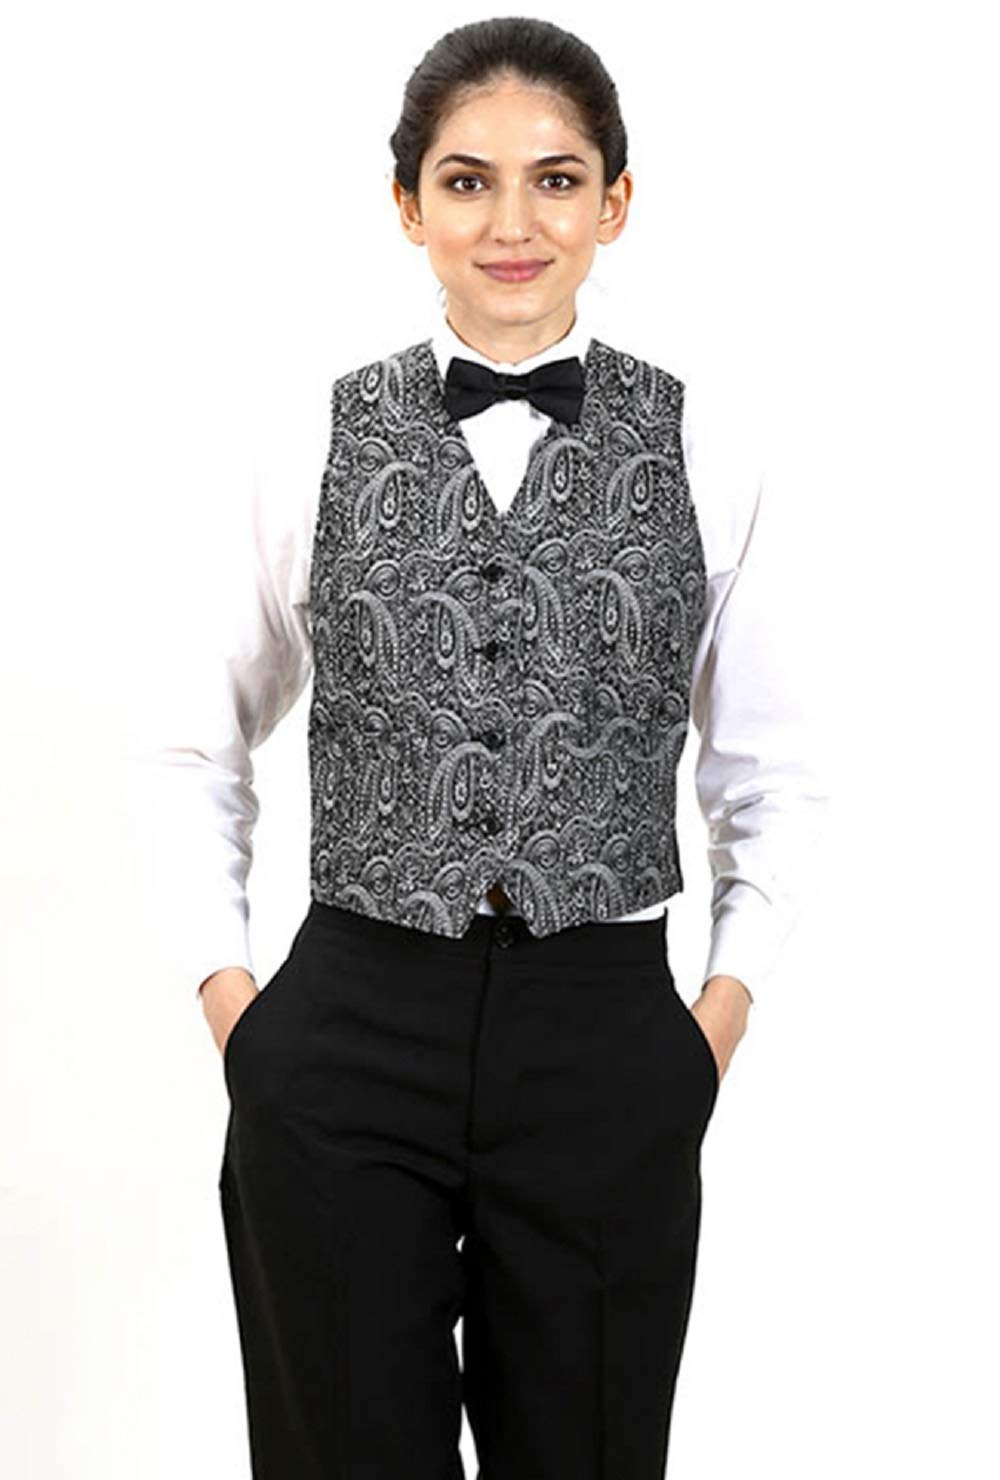 SixStarUniforms Women's Silver Formal Designer Business Suit Paisley Pattern Jacquard Vest Medium by SixStarUniforms